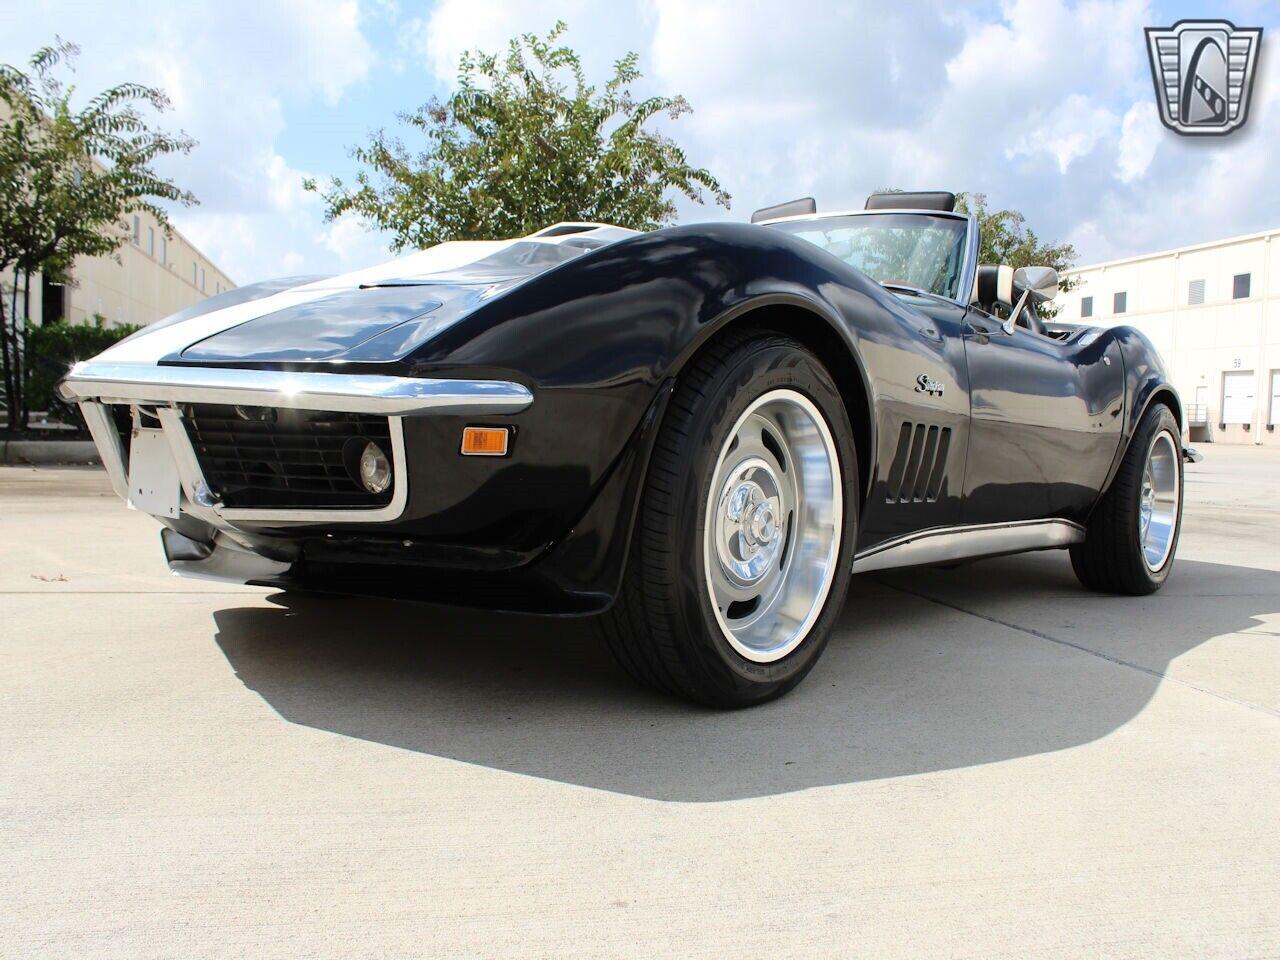 1969 Black Chevrolet Corvette   | C3 Corvette Photo 5